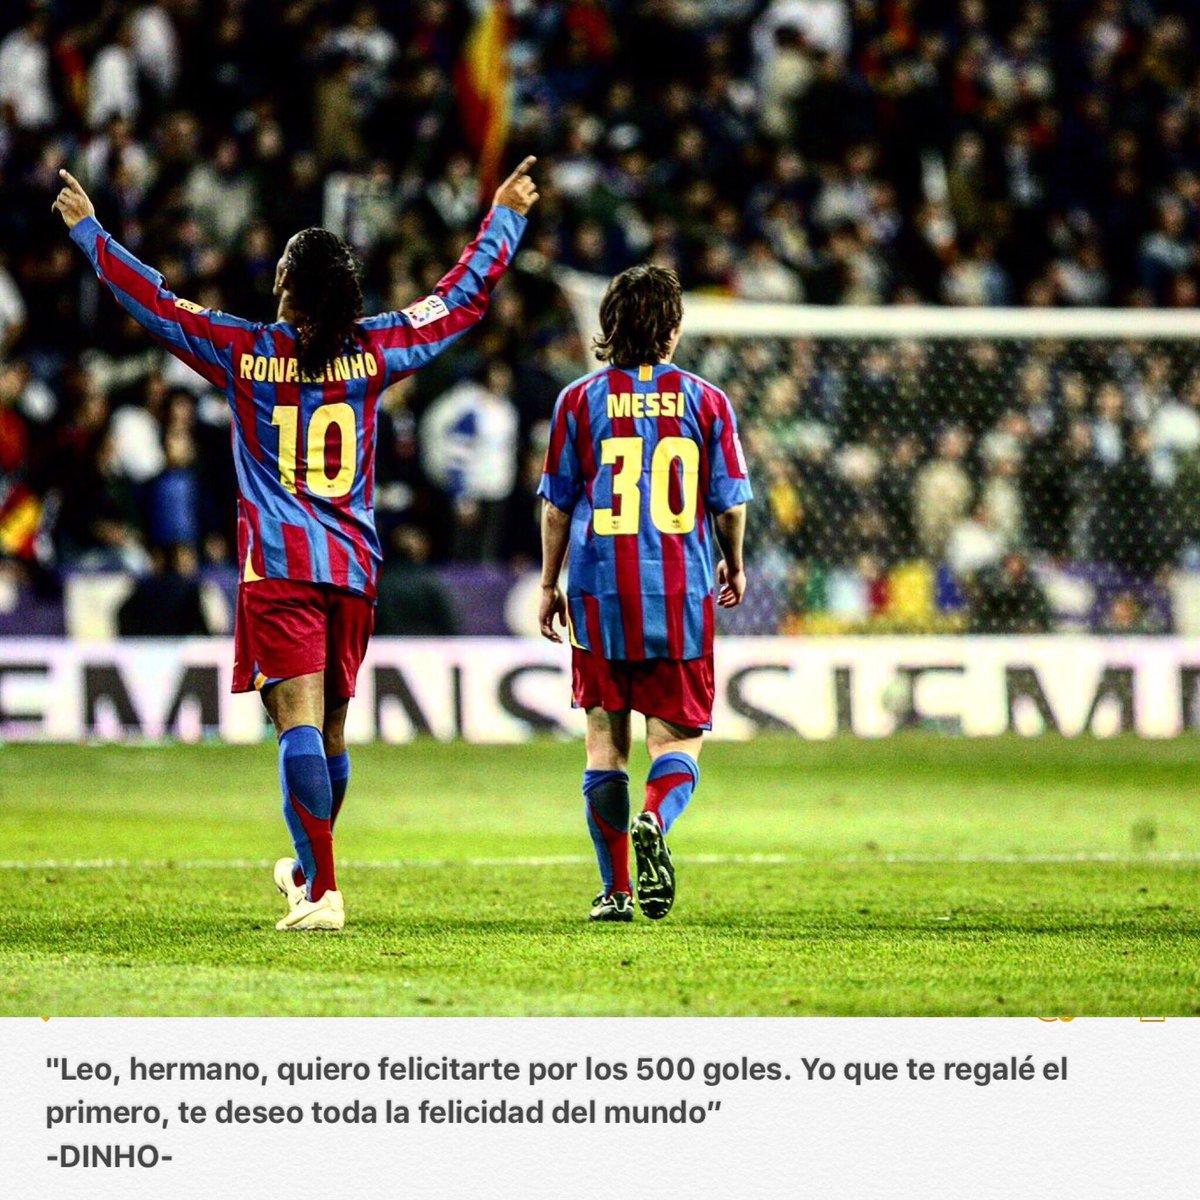 La felicitación de Ronaldinho a Lionel Messi por sus 500 goles. De crack a crack 🤜🏻🤛🏻